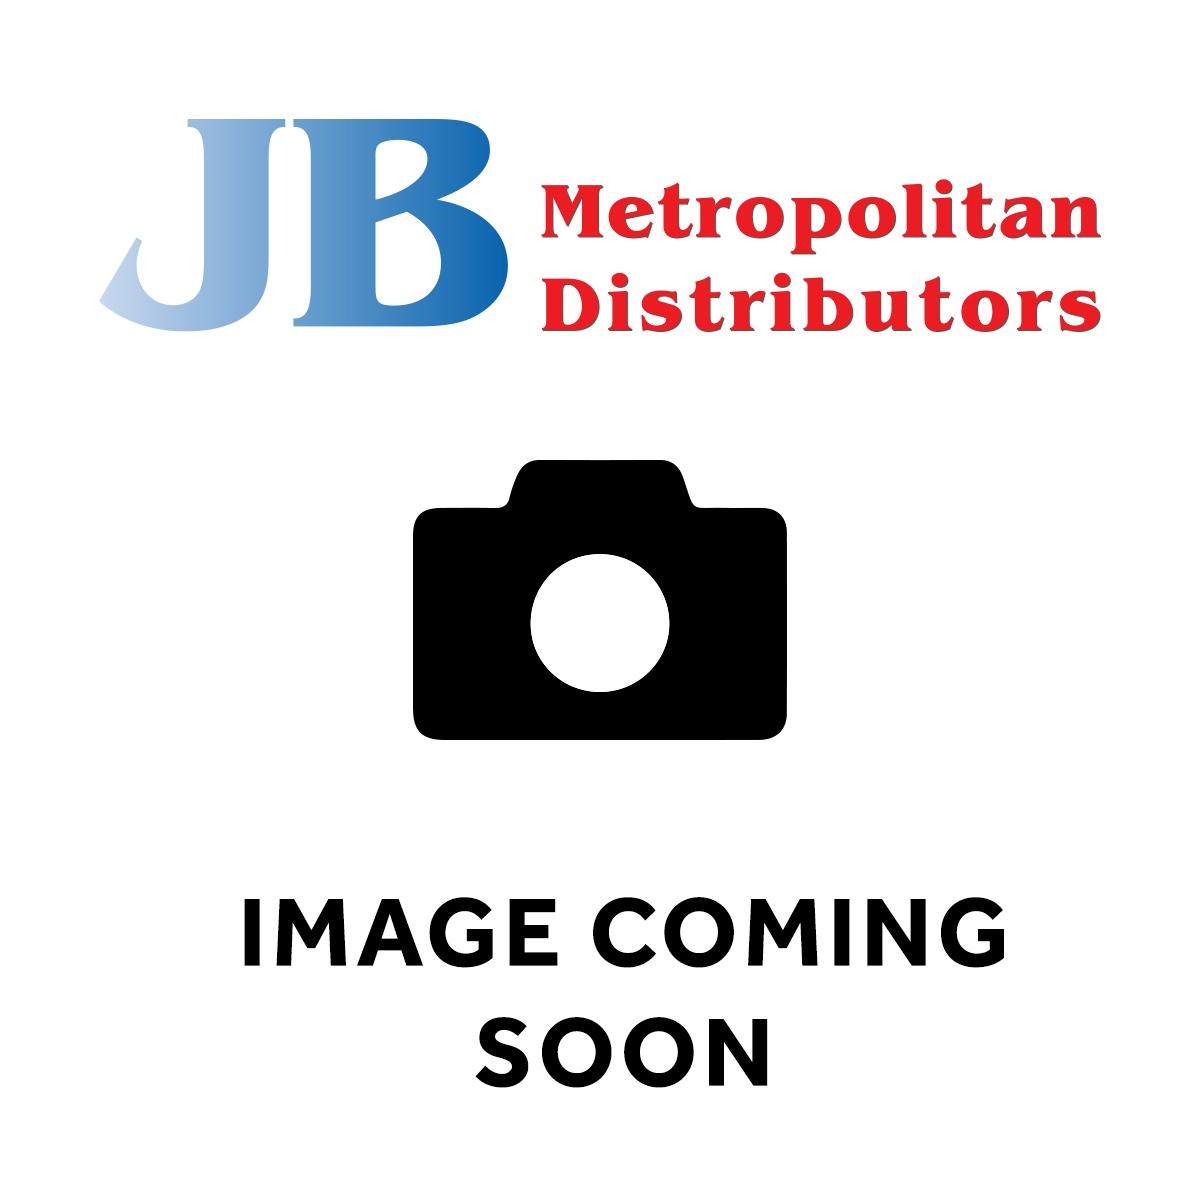 350G ARNOTTS FARMBAKE CHOCOLATE CHIP